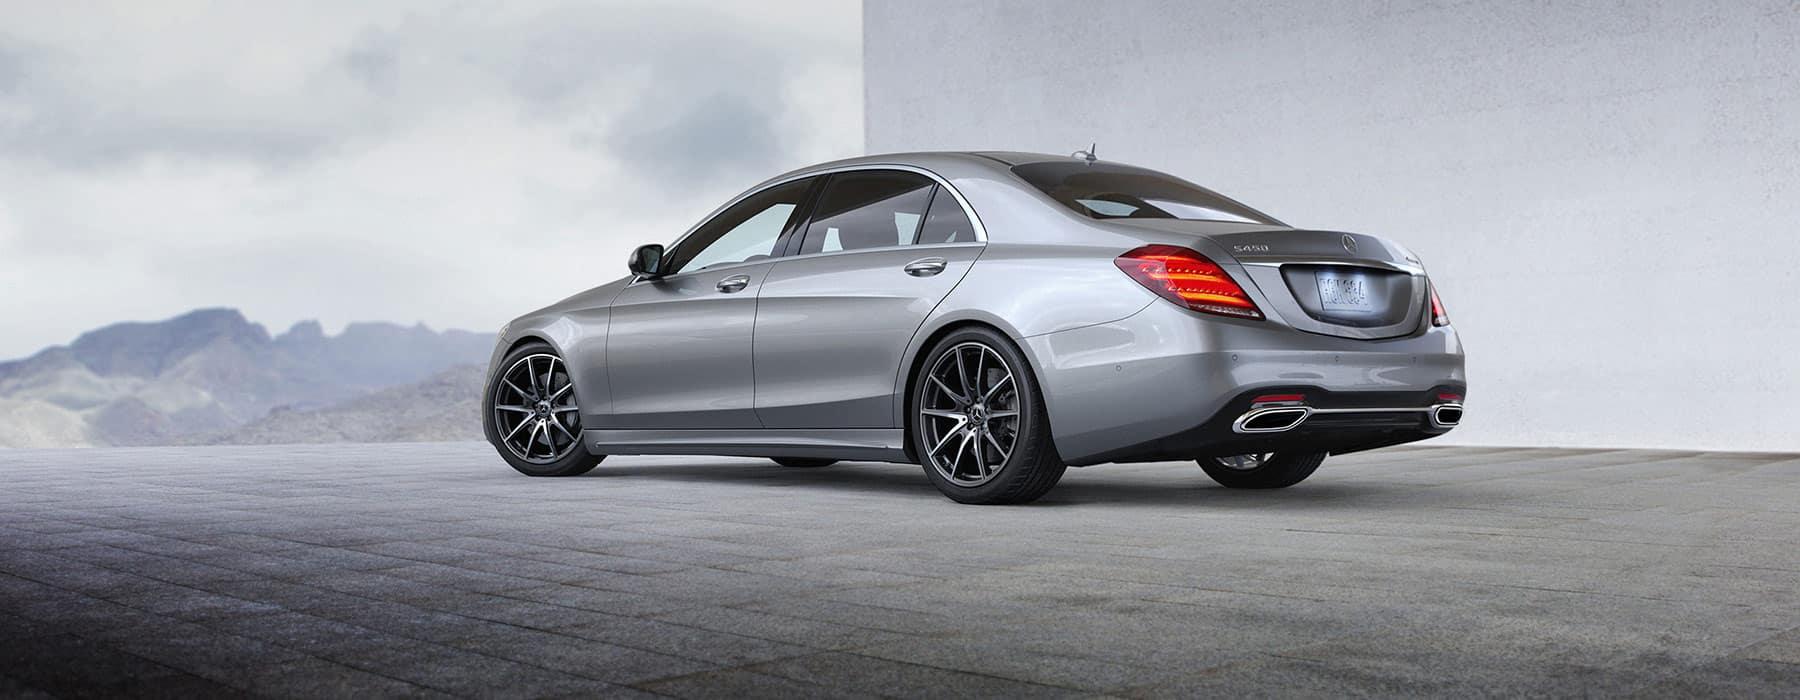 Mercedes-Benz S 450 Sedan